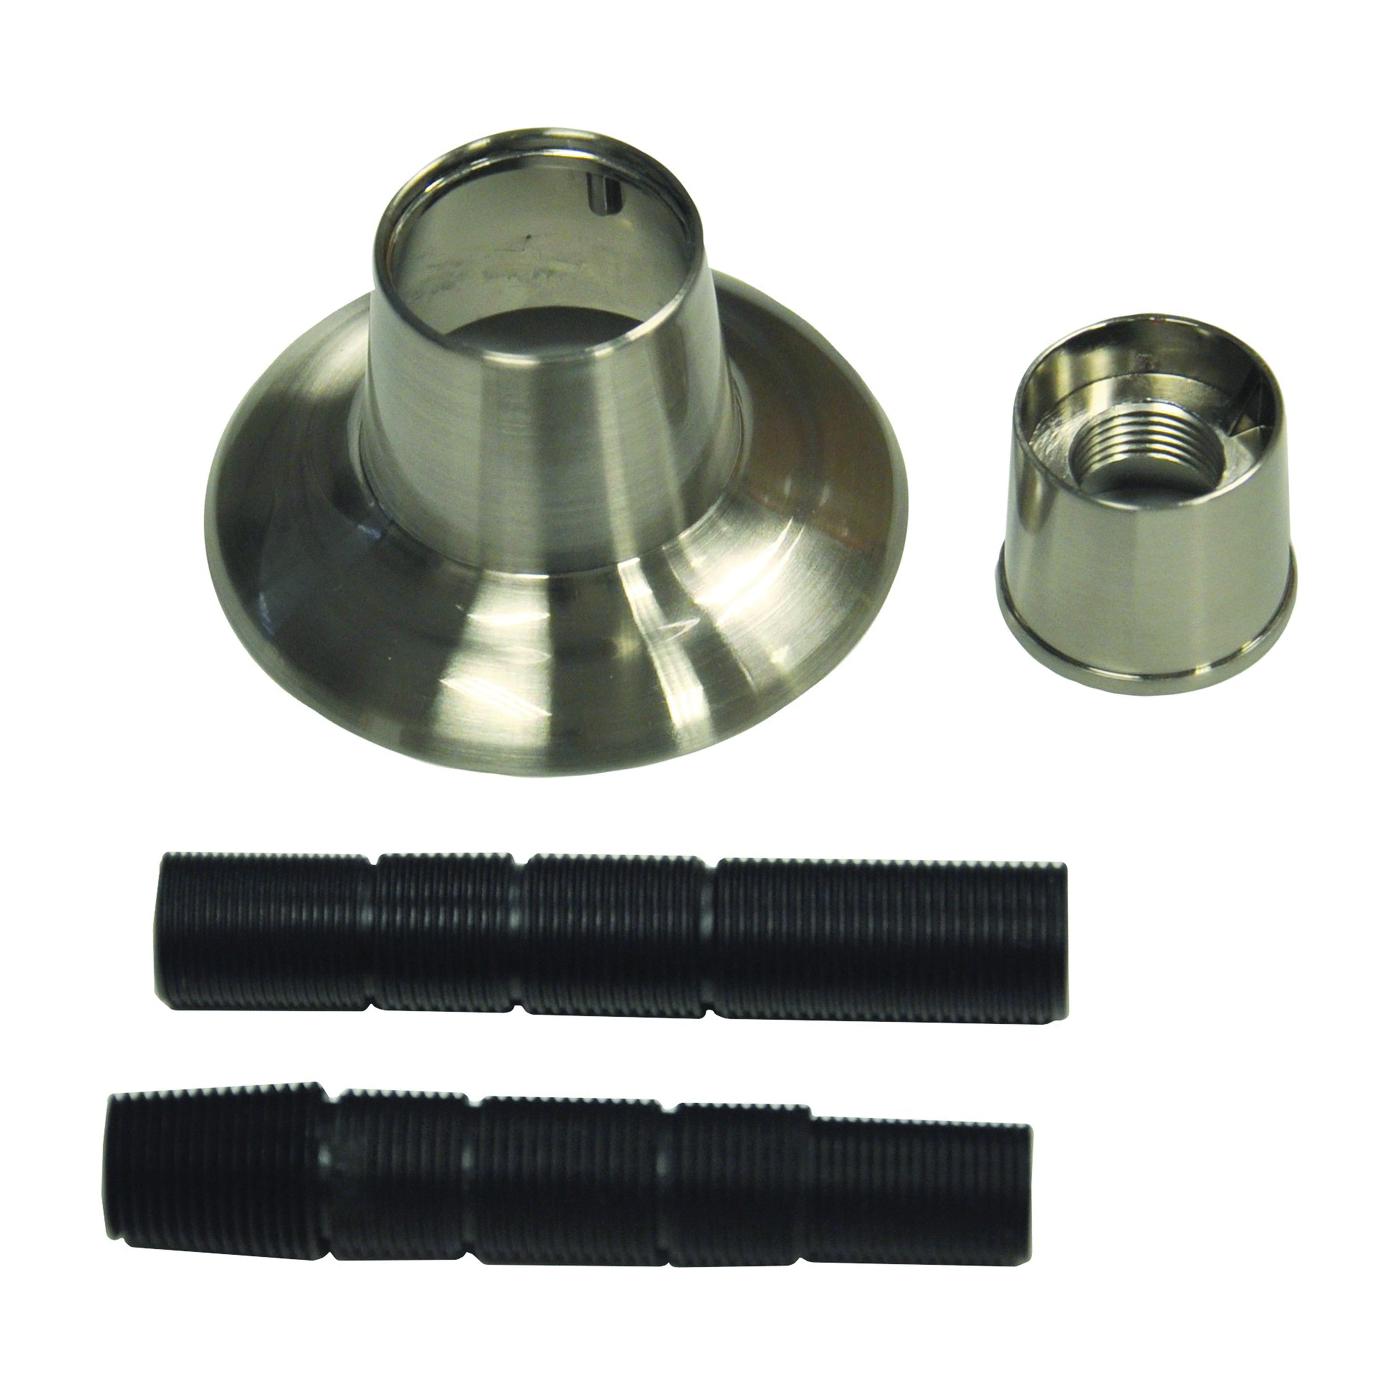 Picture of Danco 10313 Handle Flange, 1-1/8 in ID, 2-7/8 in OD, Brass/Metal/Plastic, Brushed Nickel